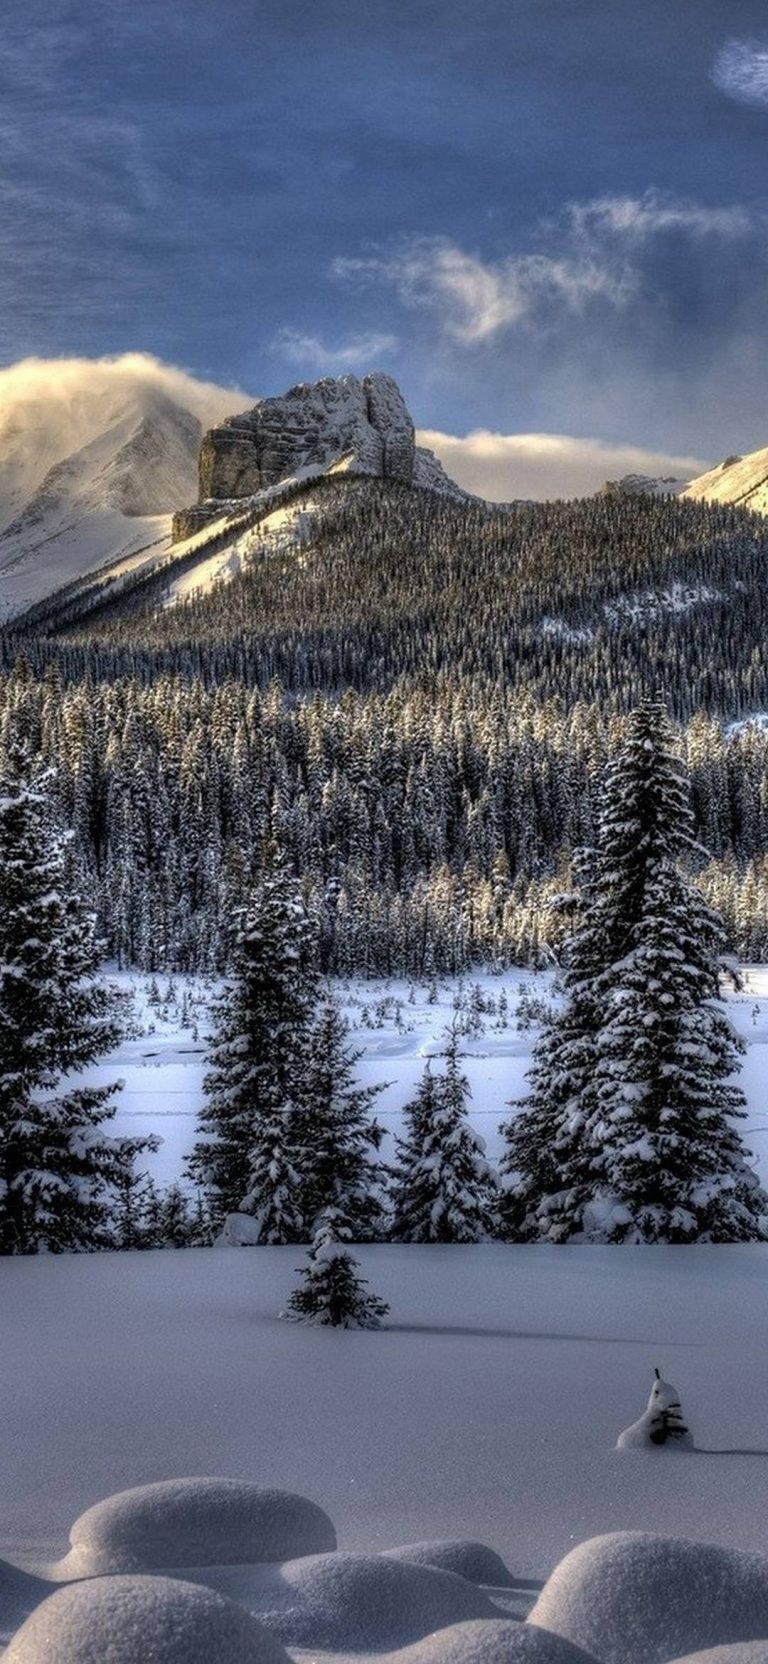 Snow Winter Trees 1080x2340 768x1664